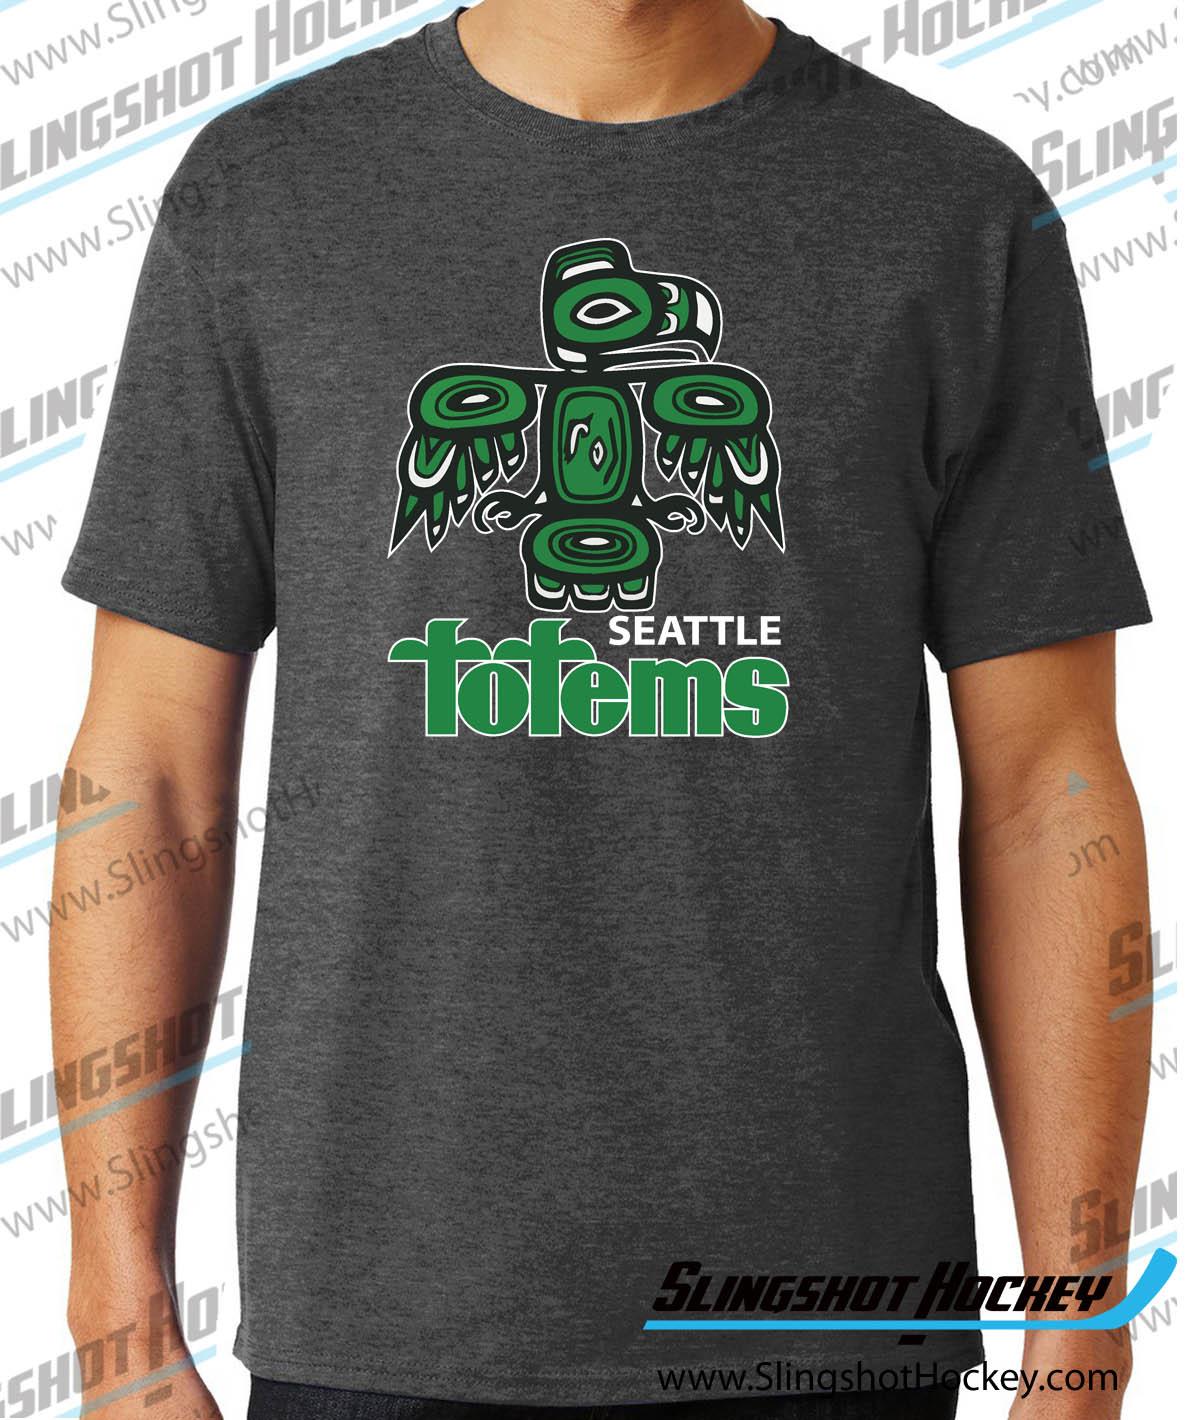 Order Now Seattle Totems Hockey Club T Shirt Slingshot Hockey